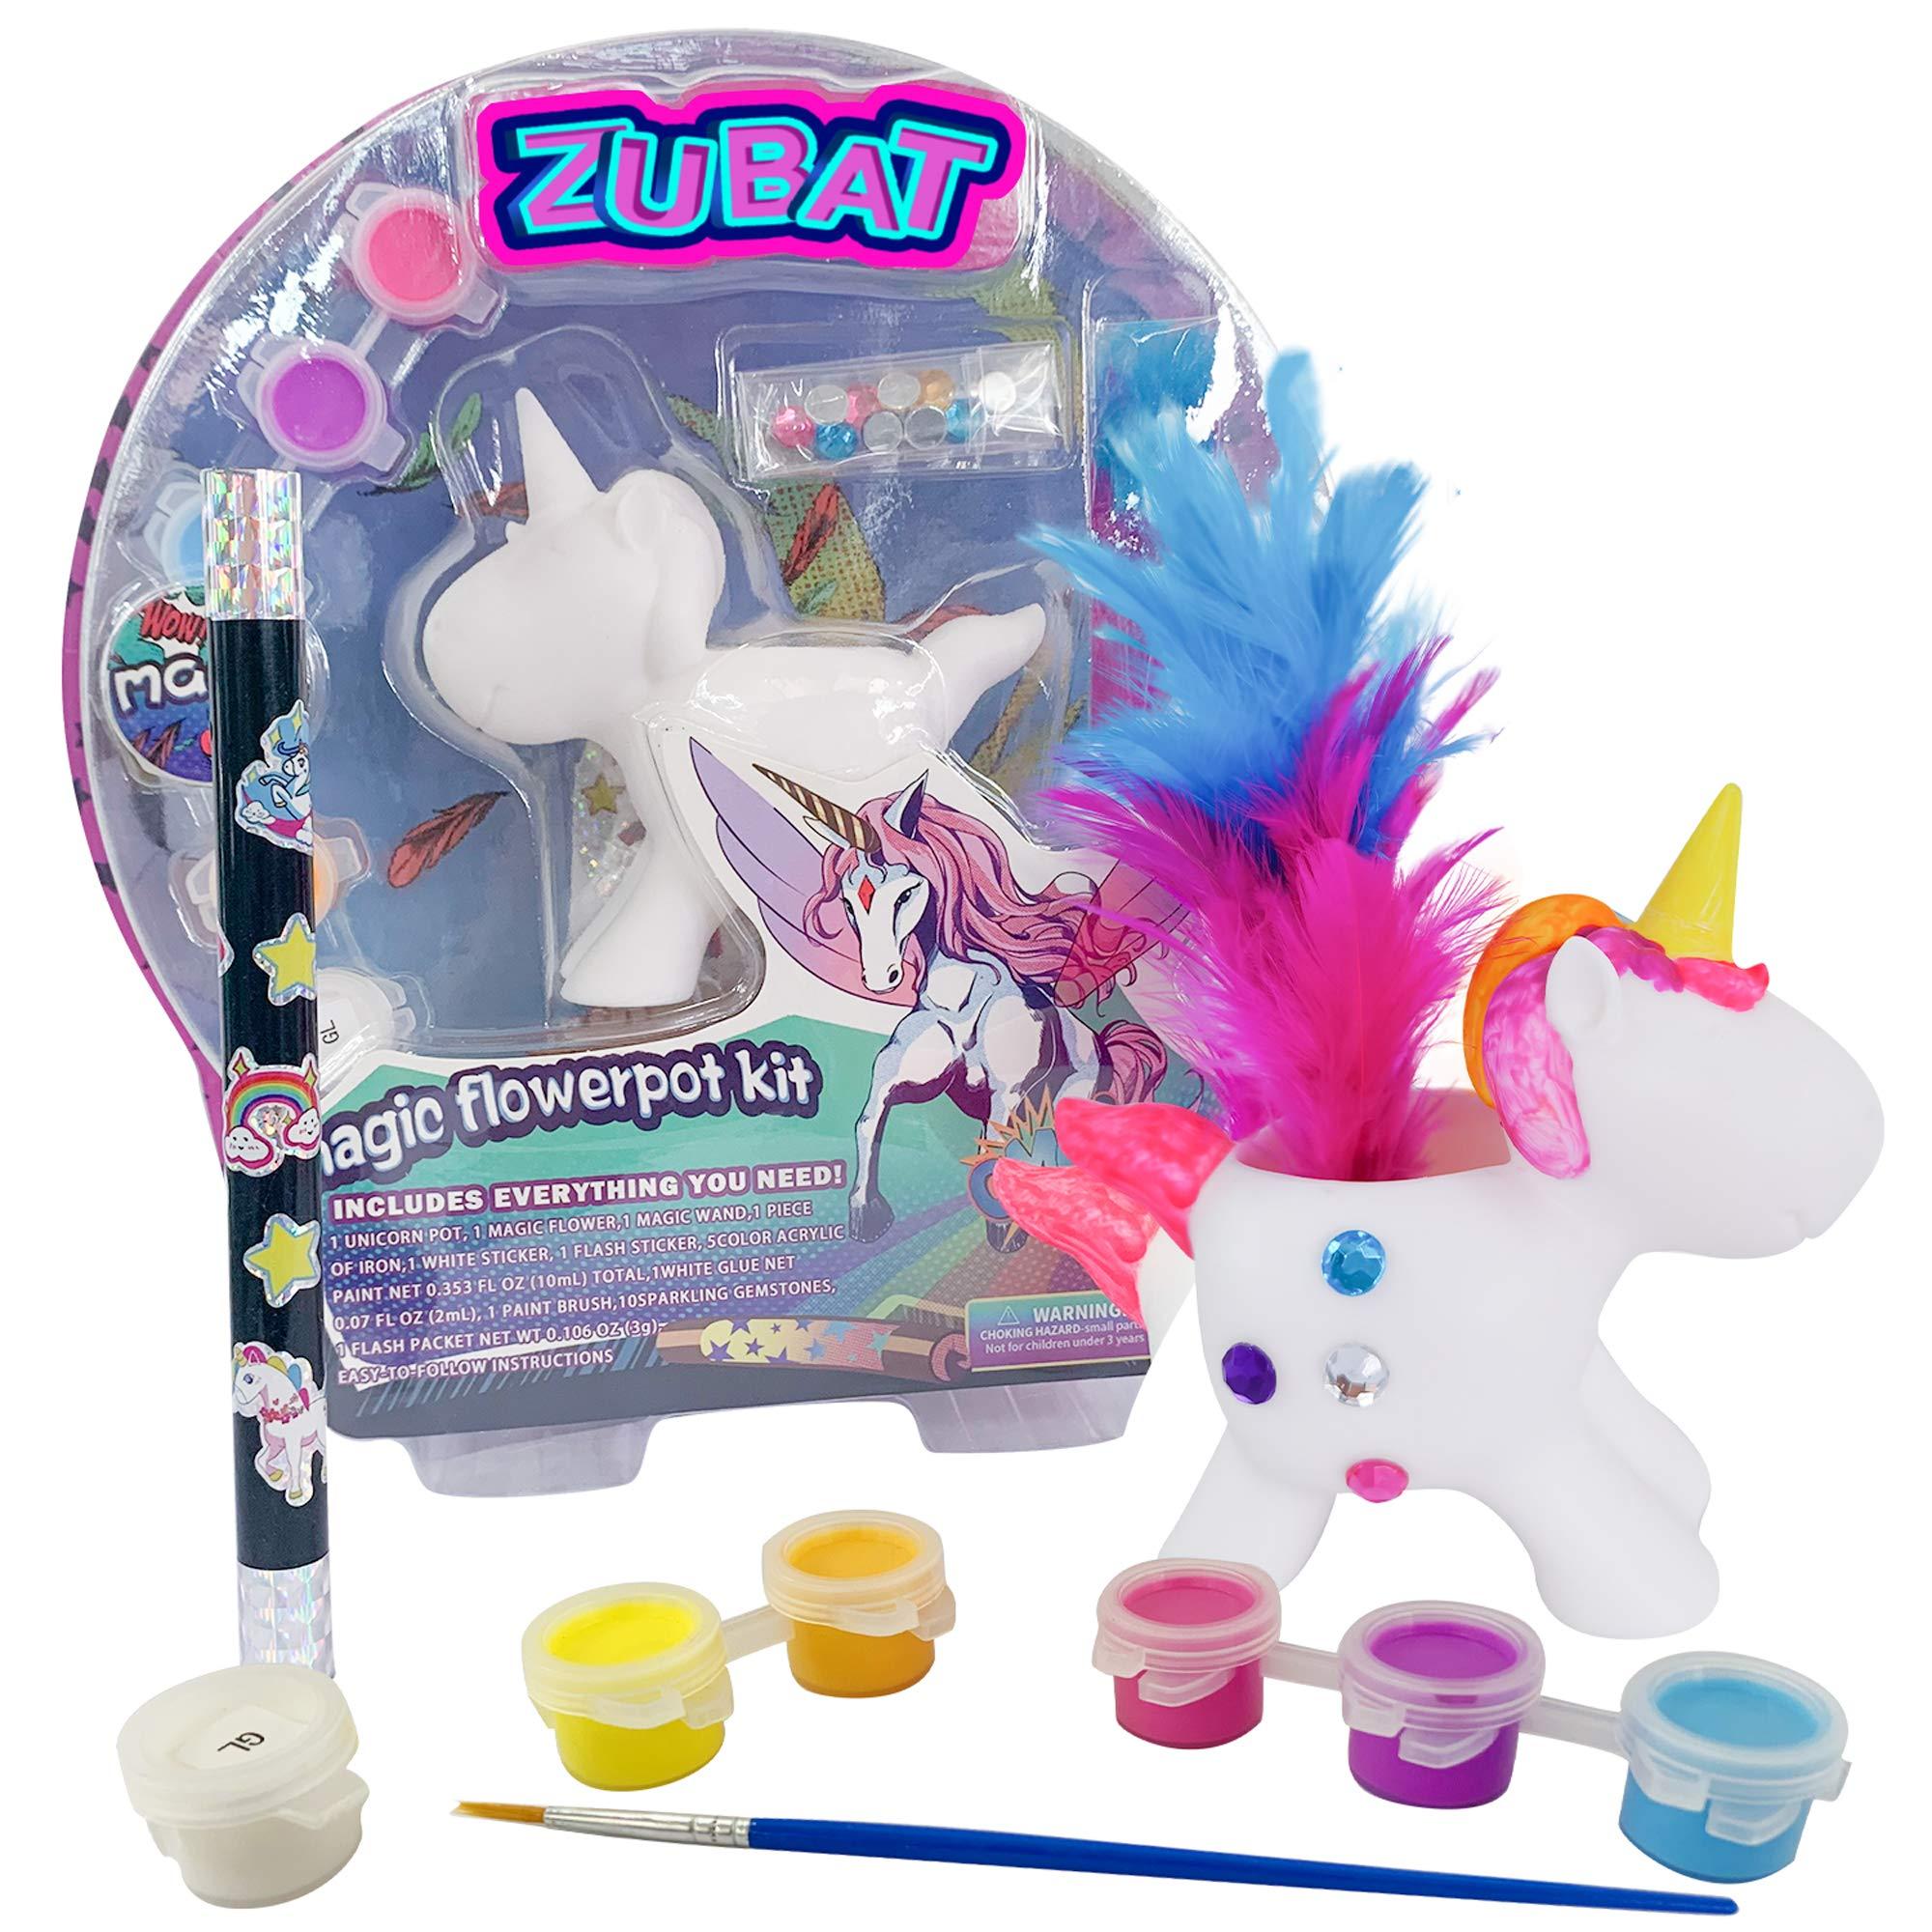 ZUBAT Unicorn Magical Appearing Flower Magic Wand, Easy Magic Tricks Toys for Kids, Magic Flower Pot Kit, DIY Paint Unicorn with Color Acrylic